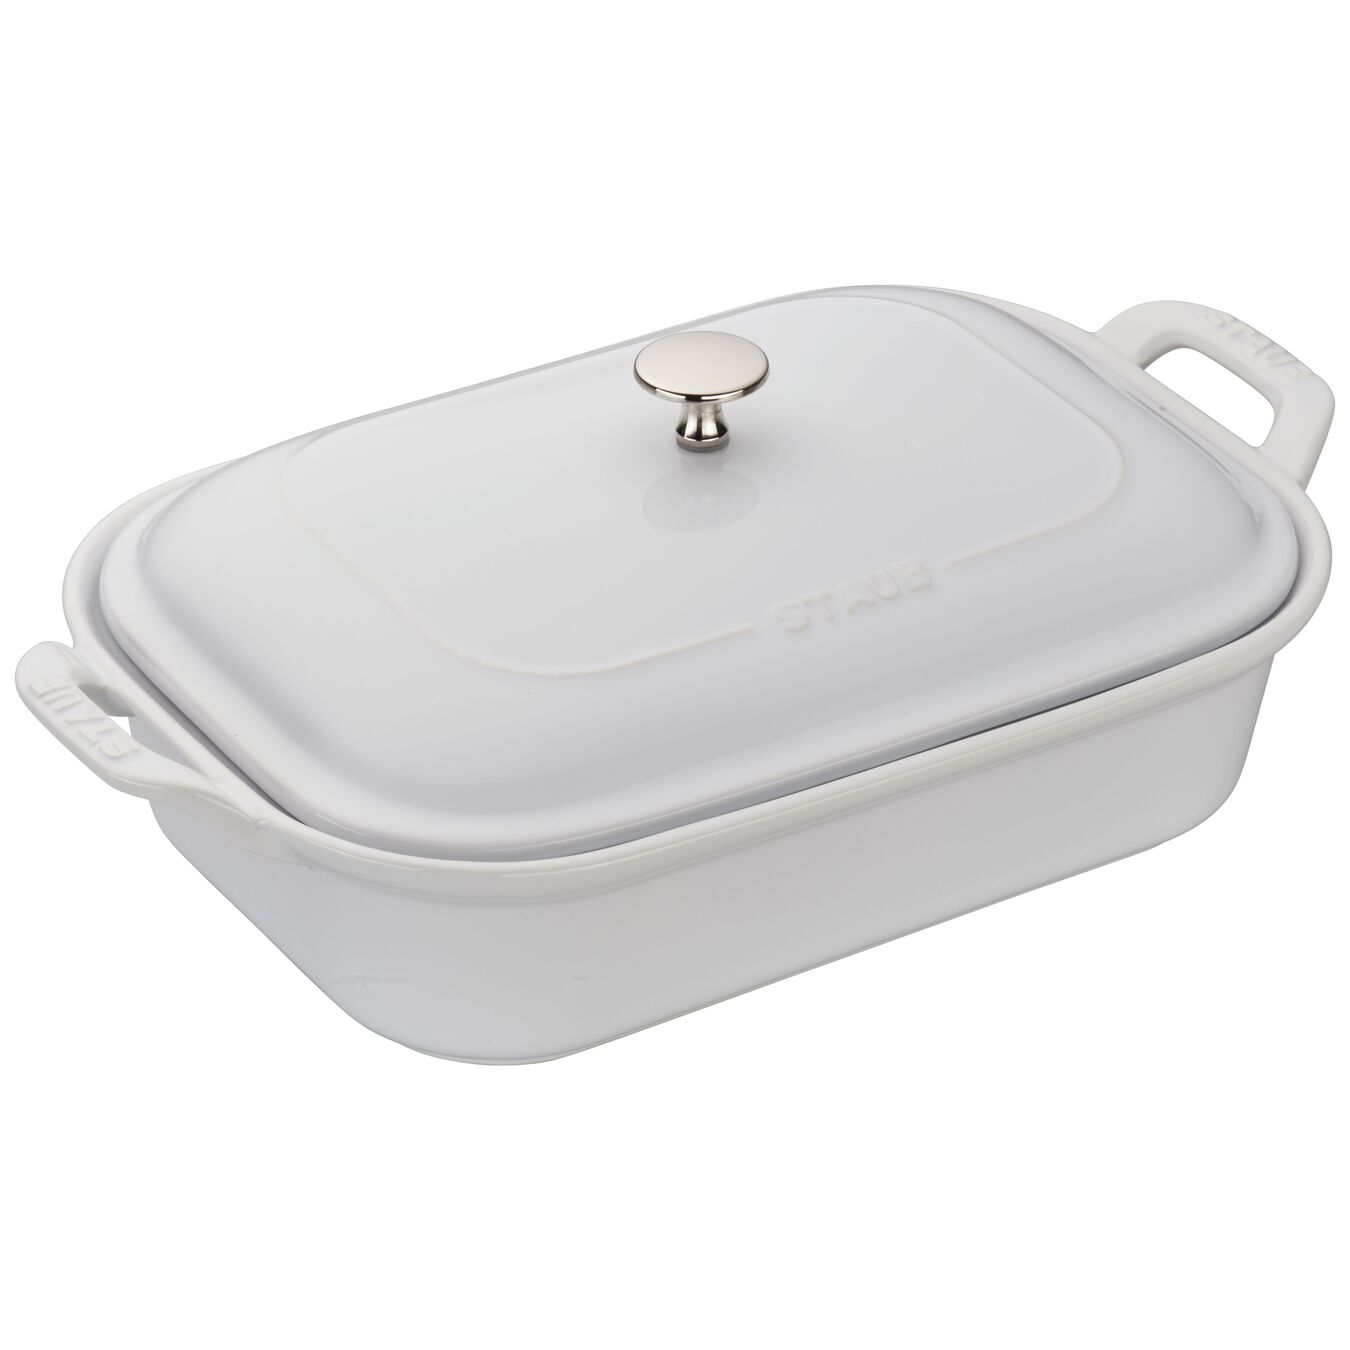 rectangular, Special shape bakeware, white,,large 1